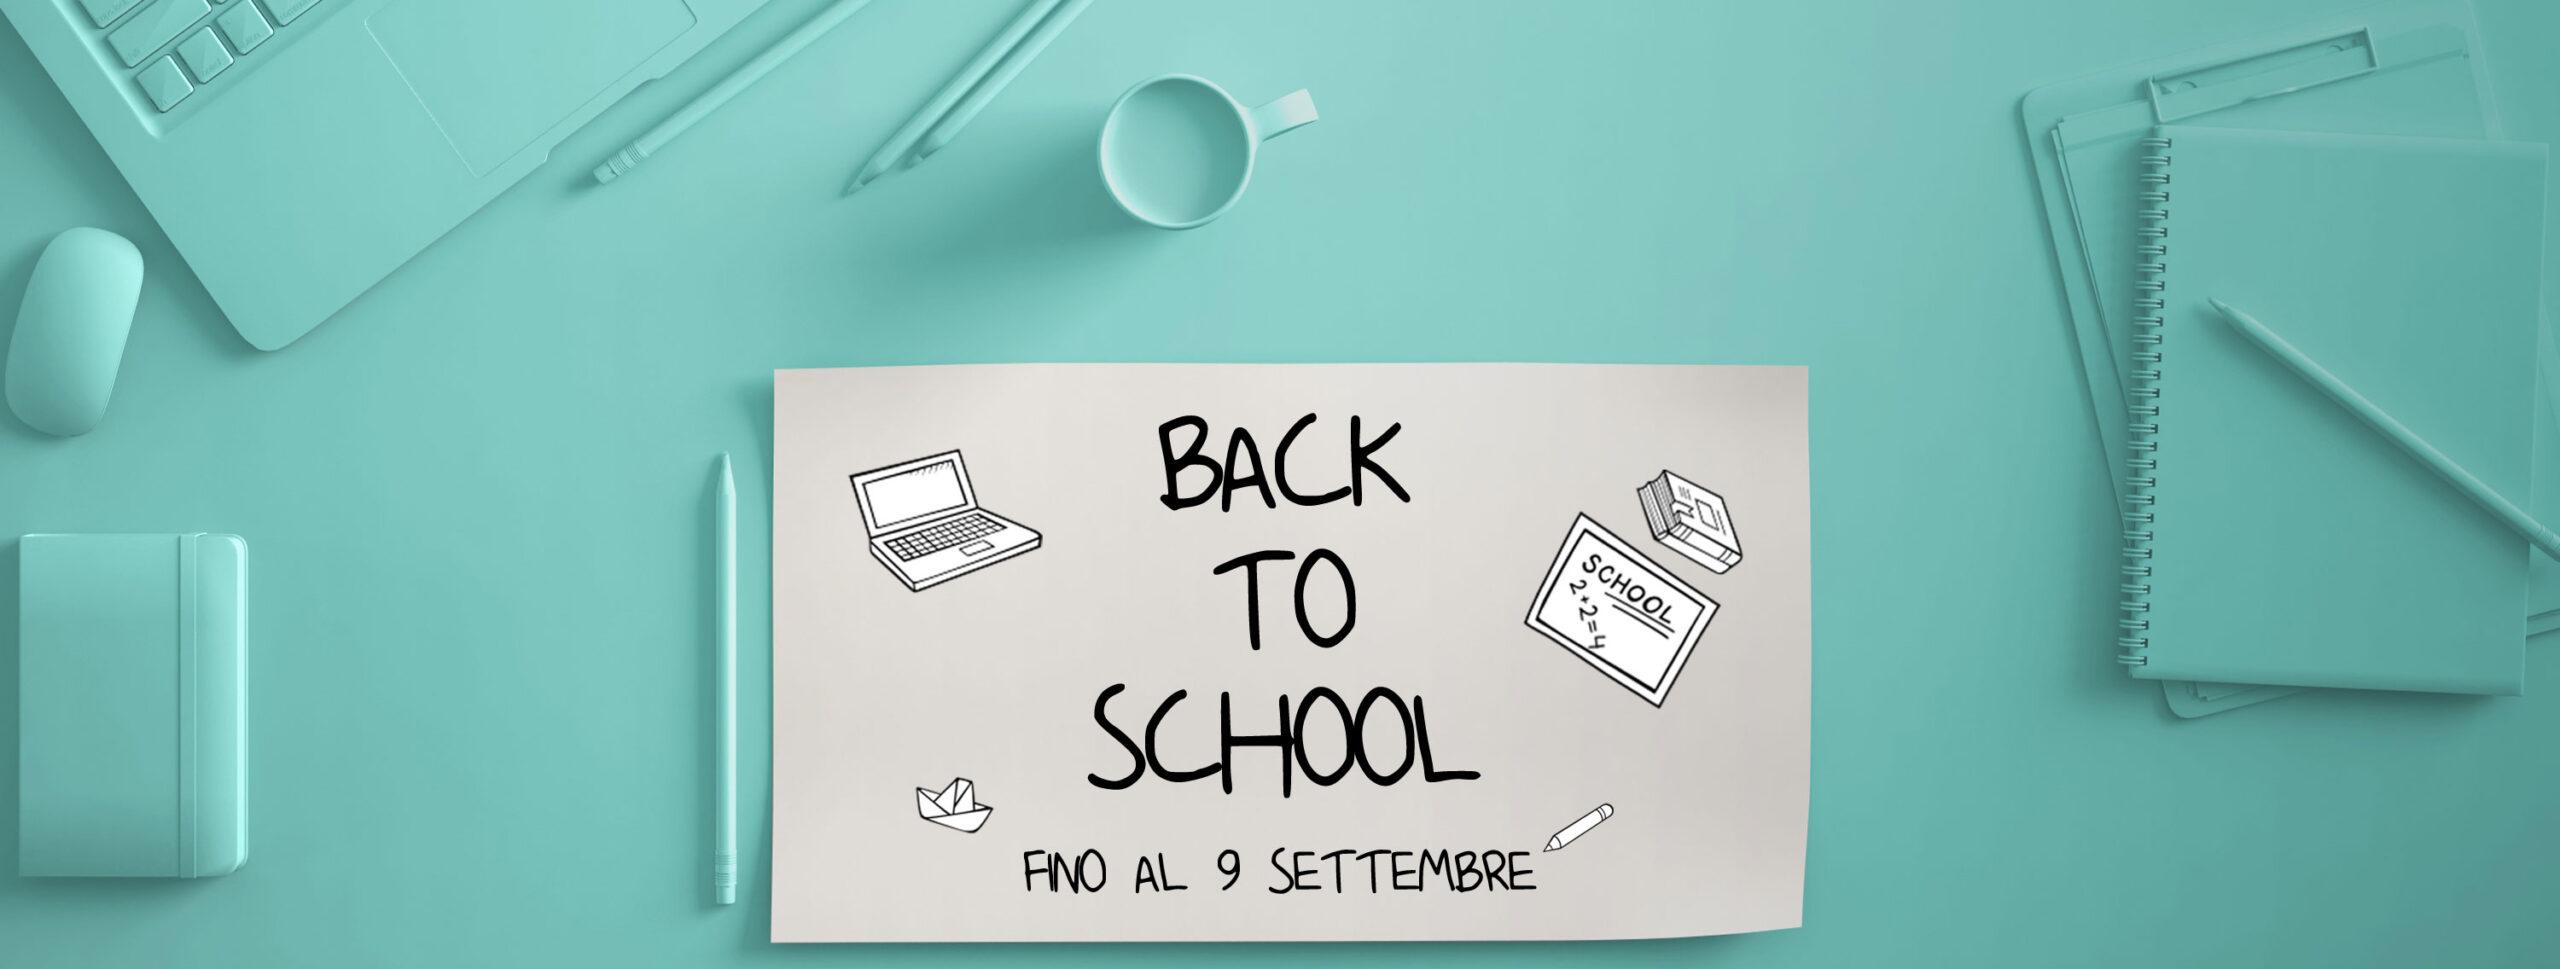 offerte unieuro back to school